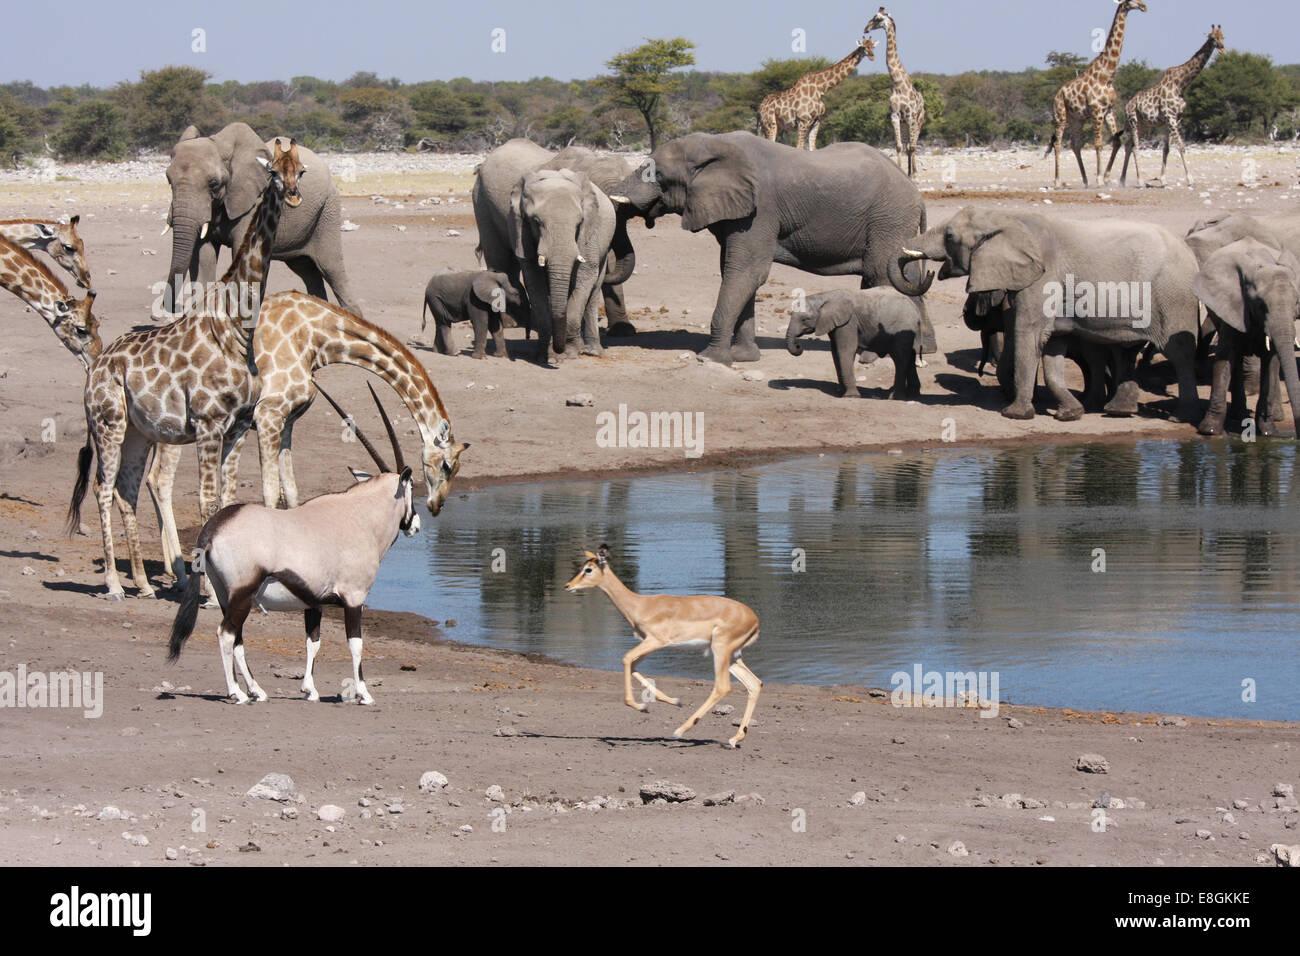 Elephants, giraffes, oryx drinking at watering hole, Namibia - Stock Image